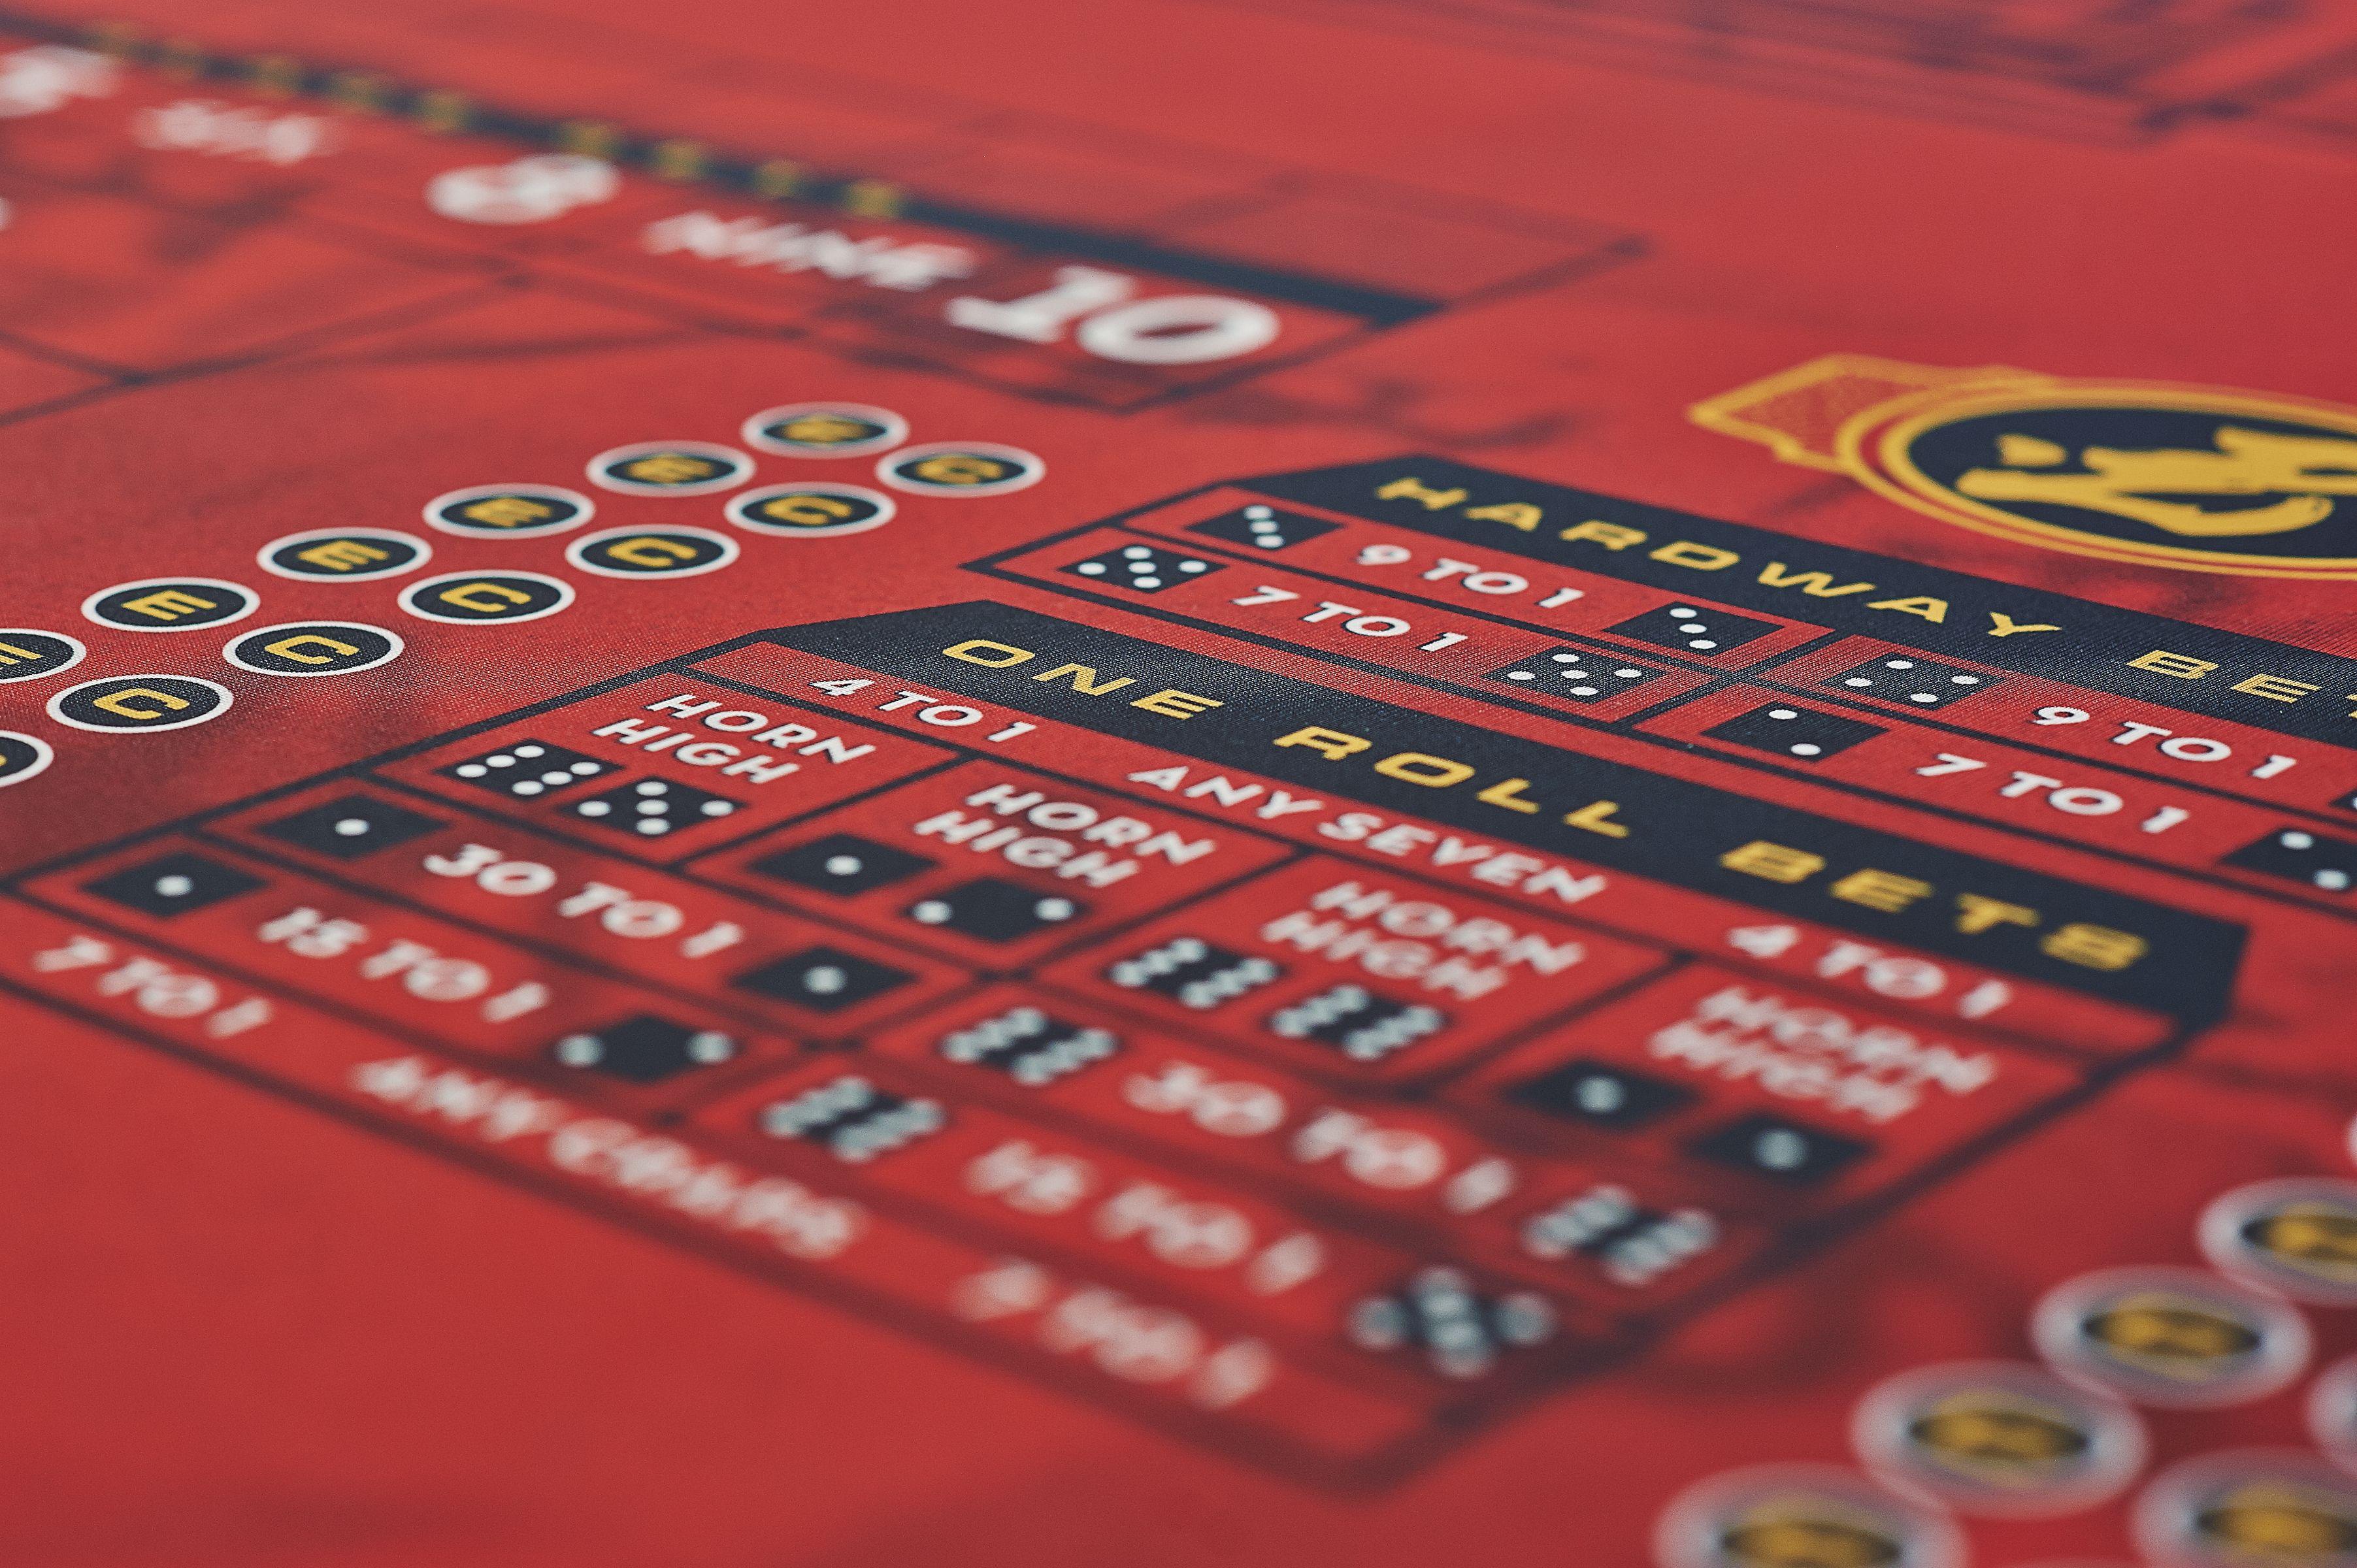 CUSTOM FELT FOR CASINO DICE TABLE Casino graphics